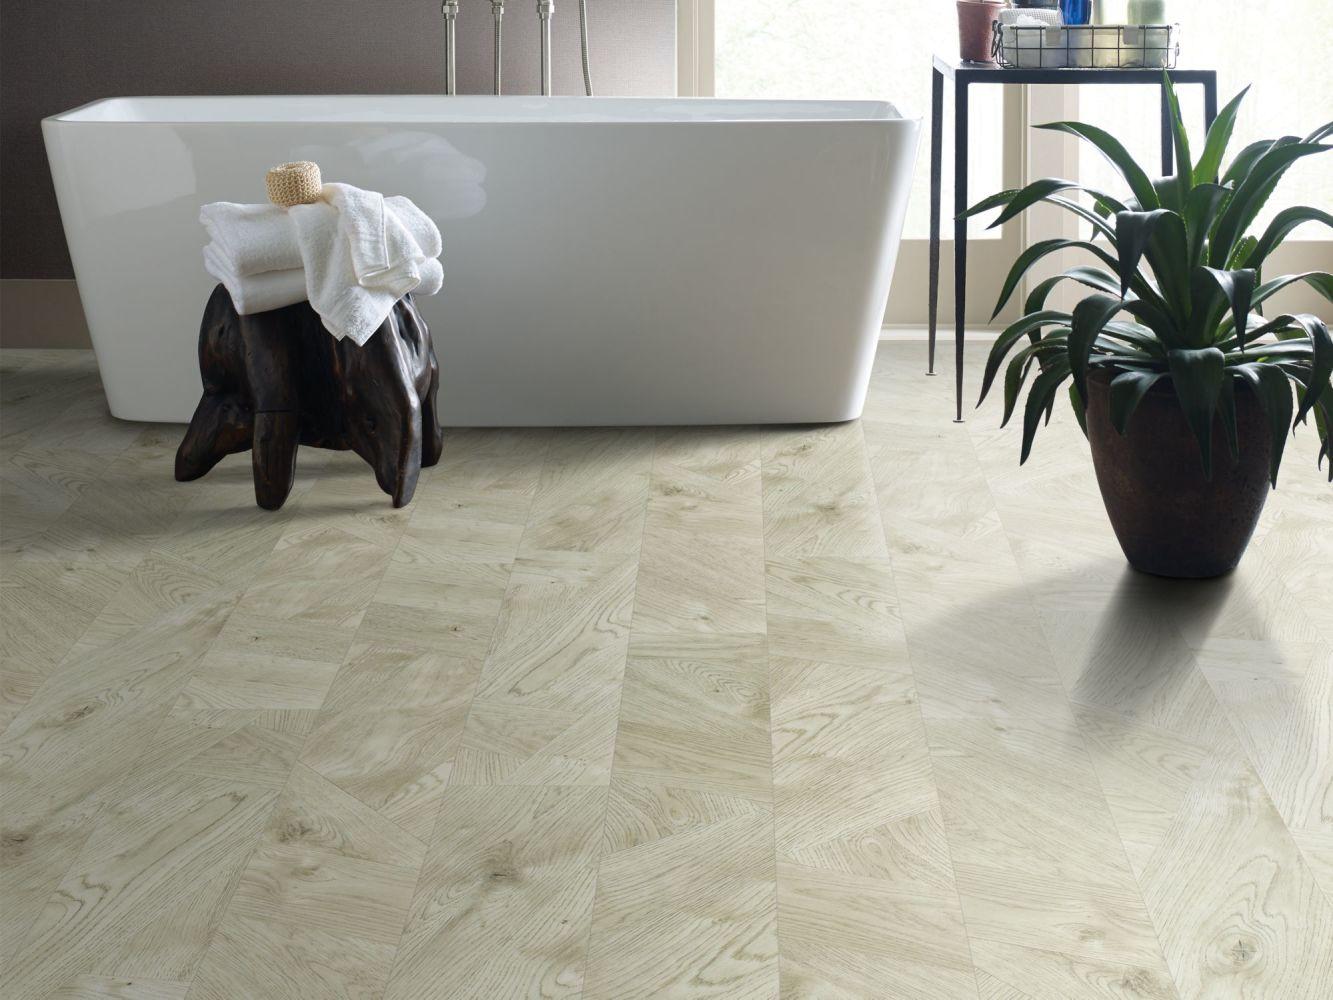 Shaw Floors Resilient Residential Tenacious Hd+ Milled Bazaar Ginger 01054_3010V